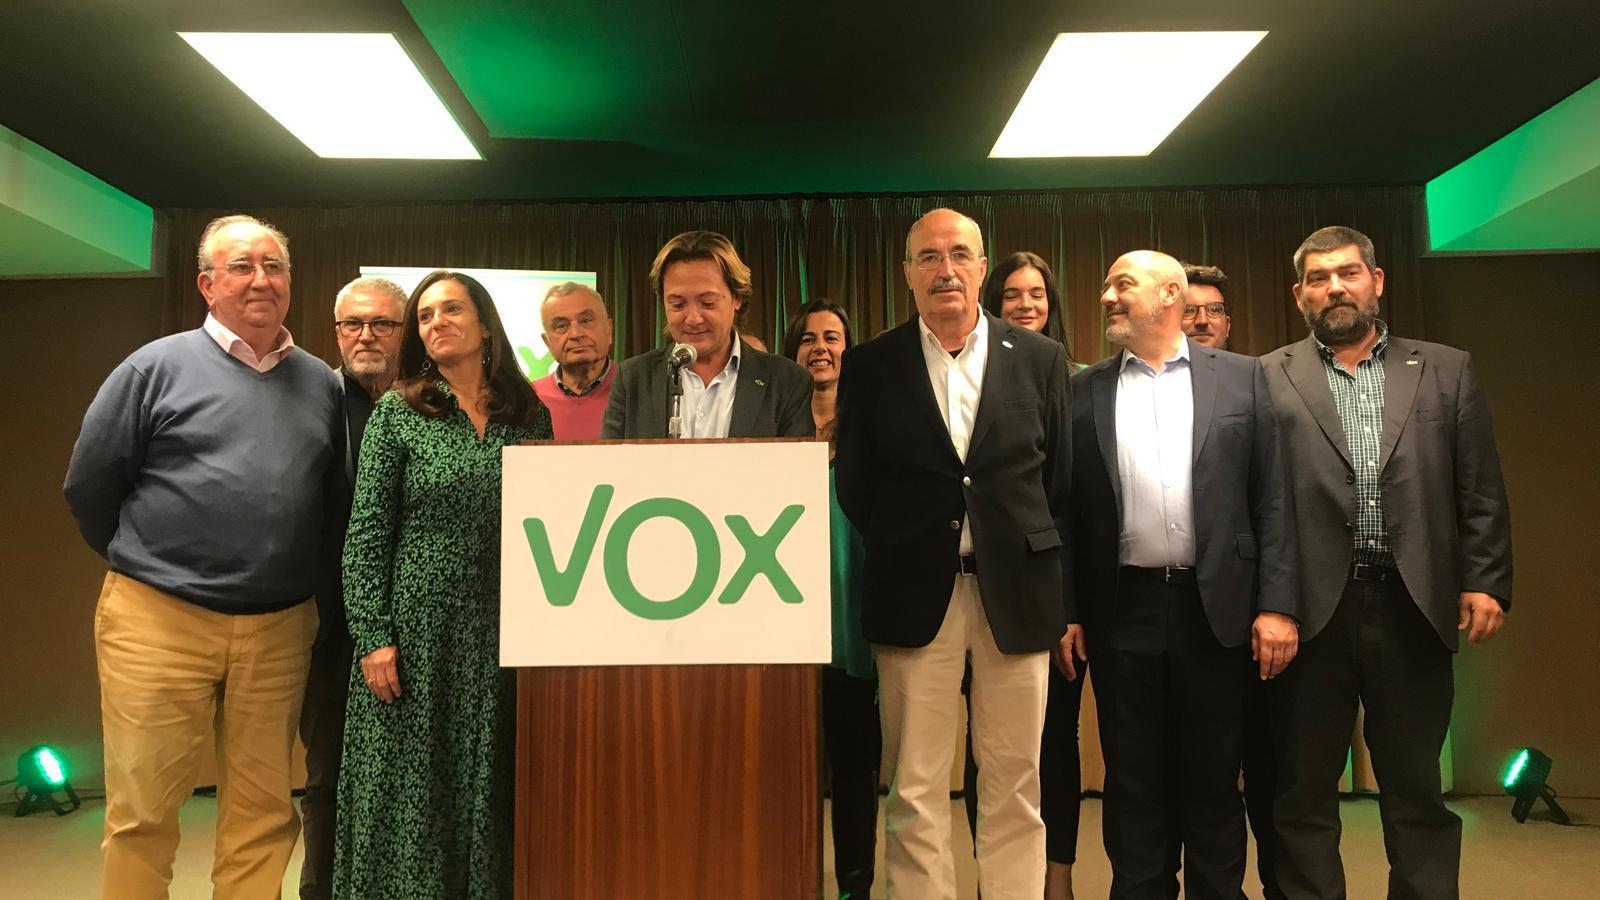 Voxarriba als dos diputats per Balears sense fer renou